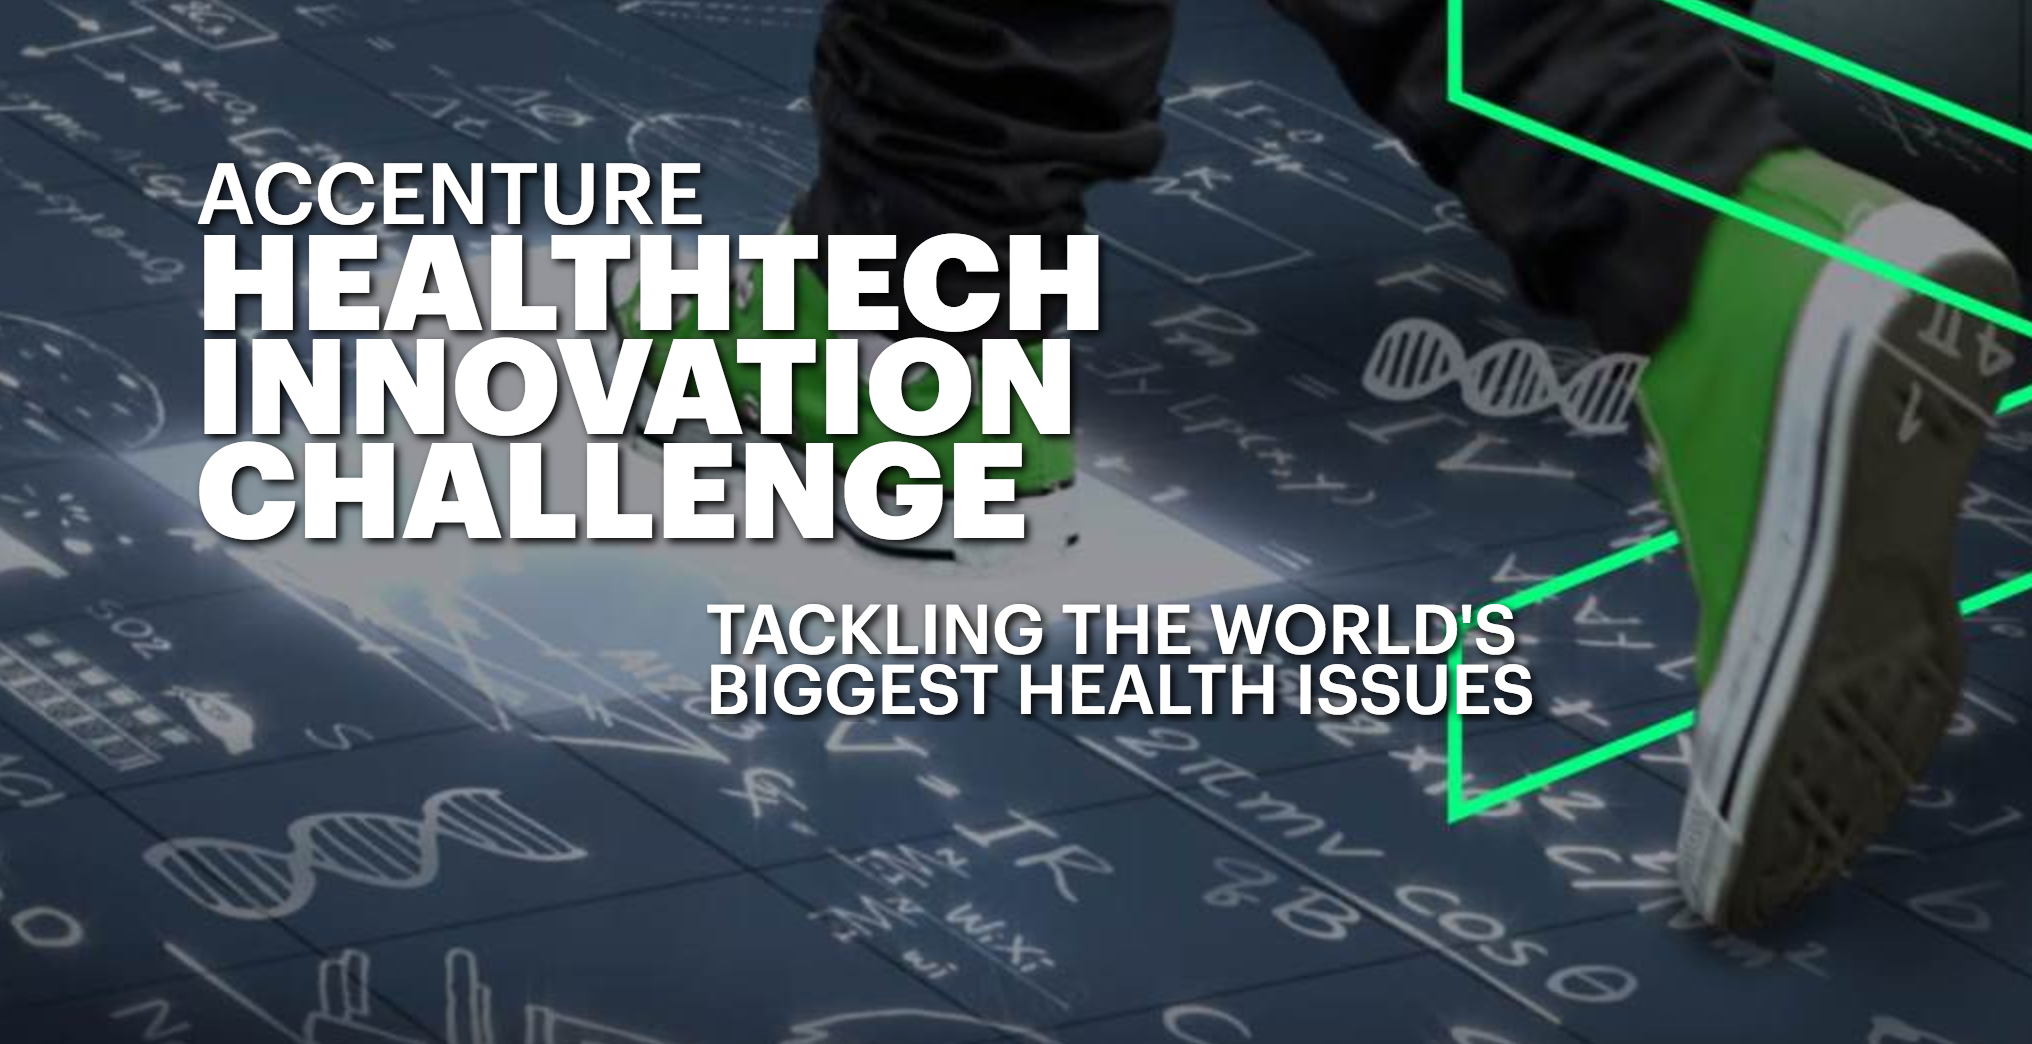 Accenture HealthTech Innovation Challenge 2017-2018